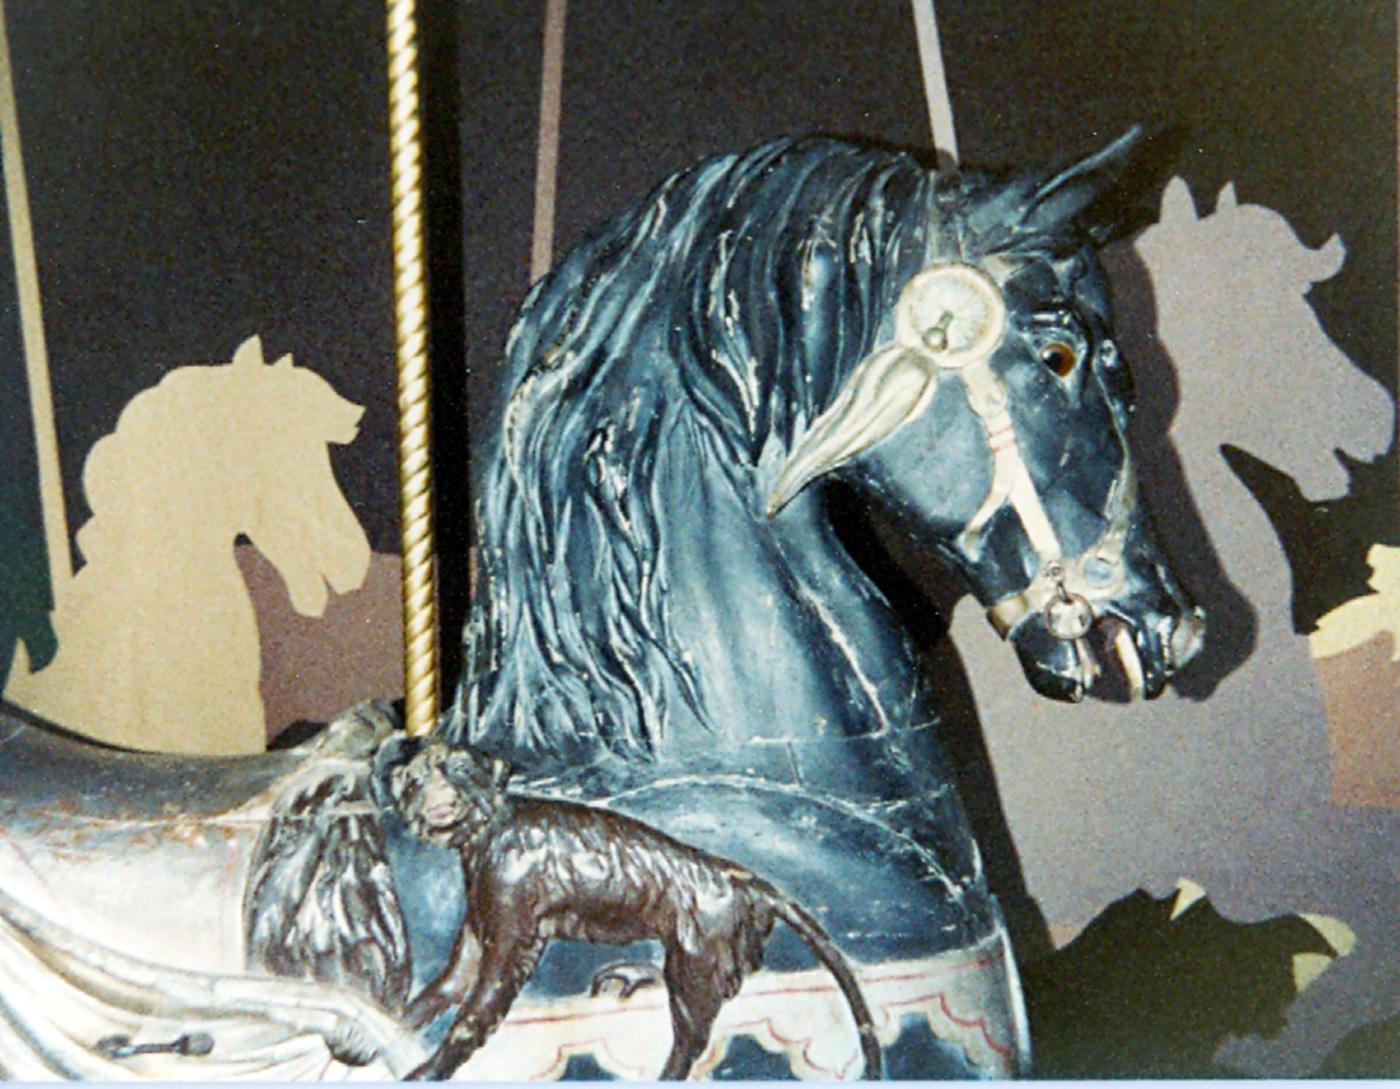 dentzel-stander-bust-american-carousel-museum-1981